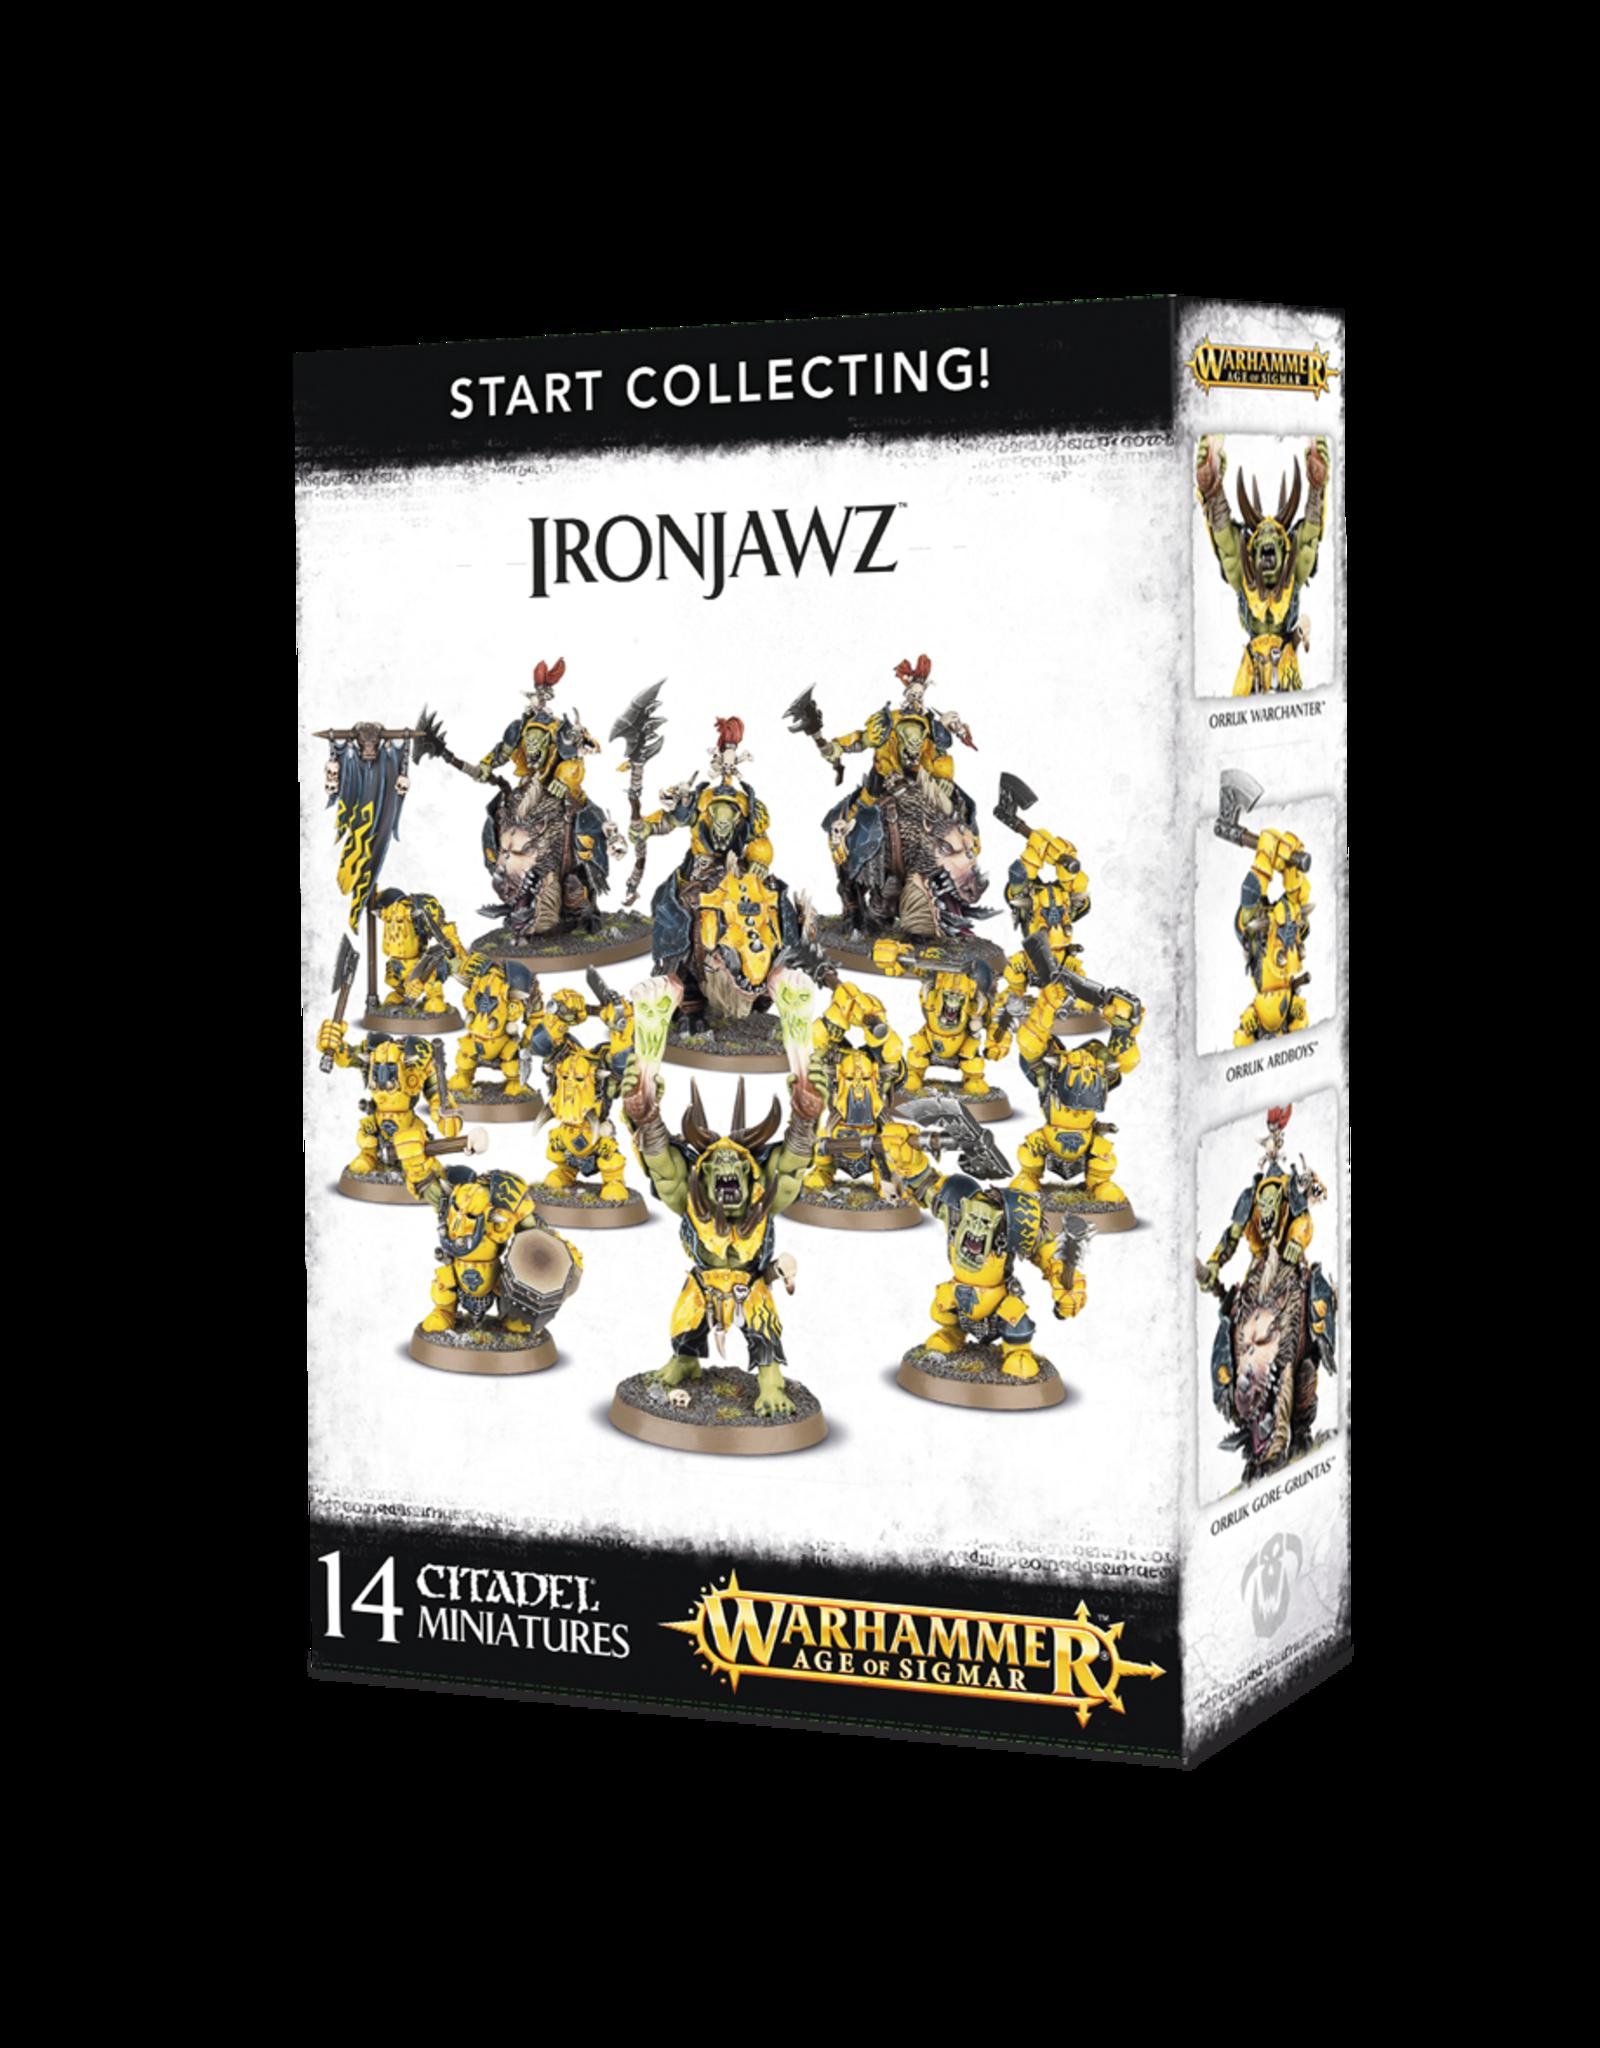 Warhammer Age of Sigmar Start Collecting! Ironjawz